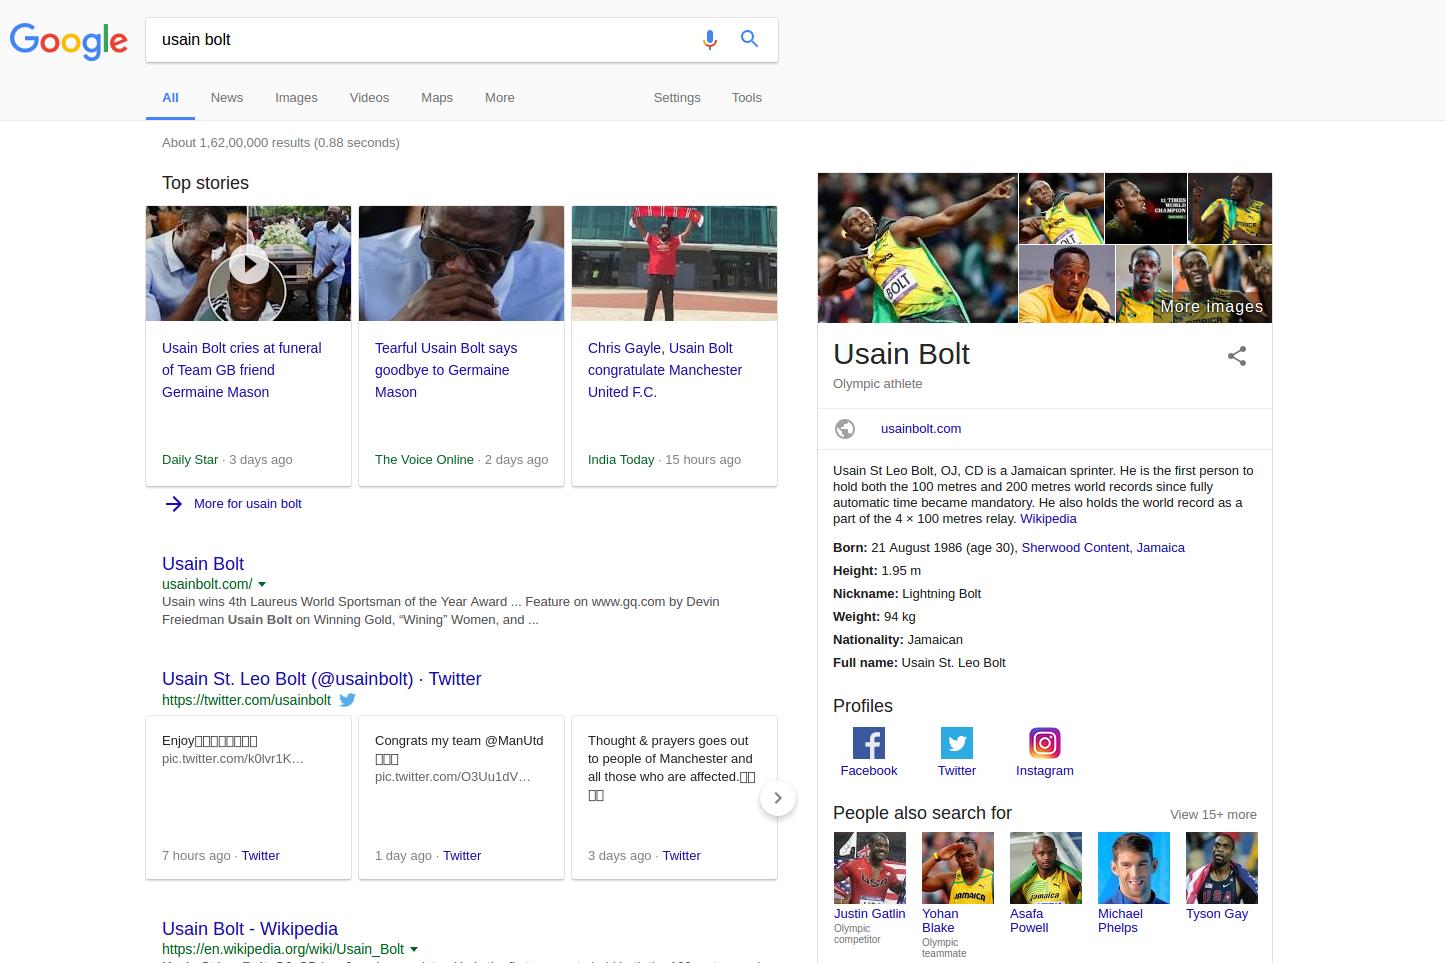 Keyword Based Search